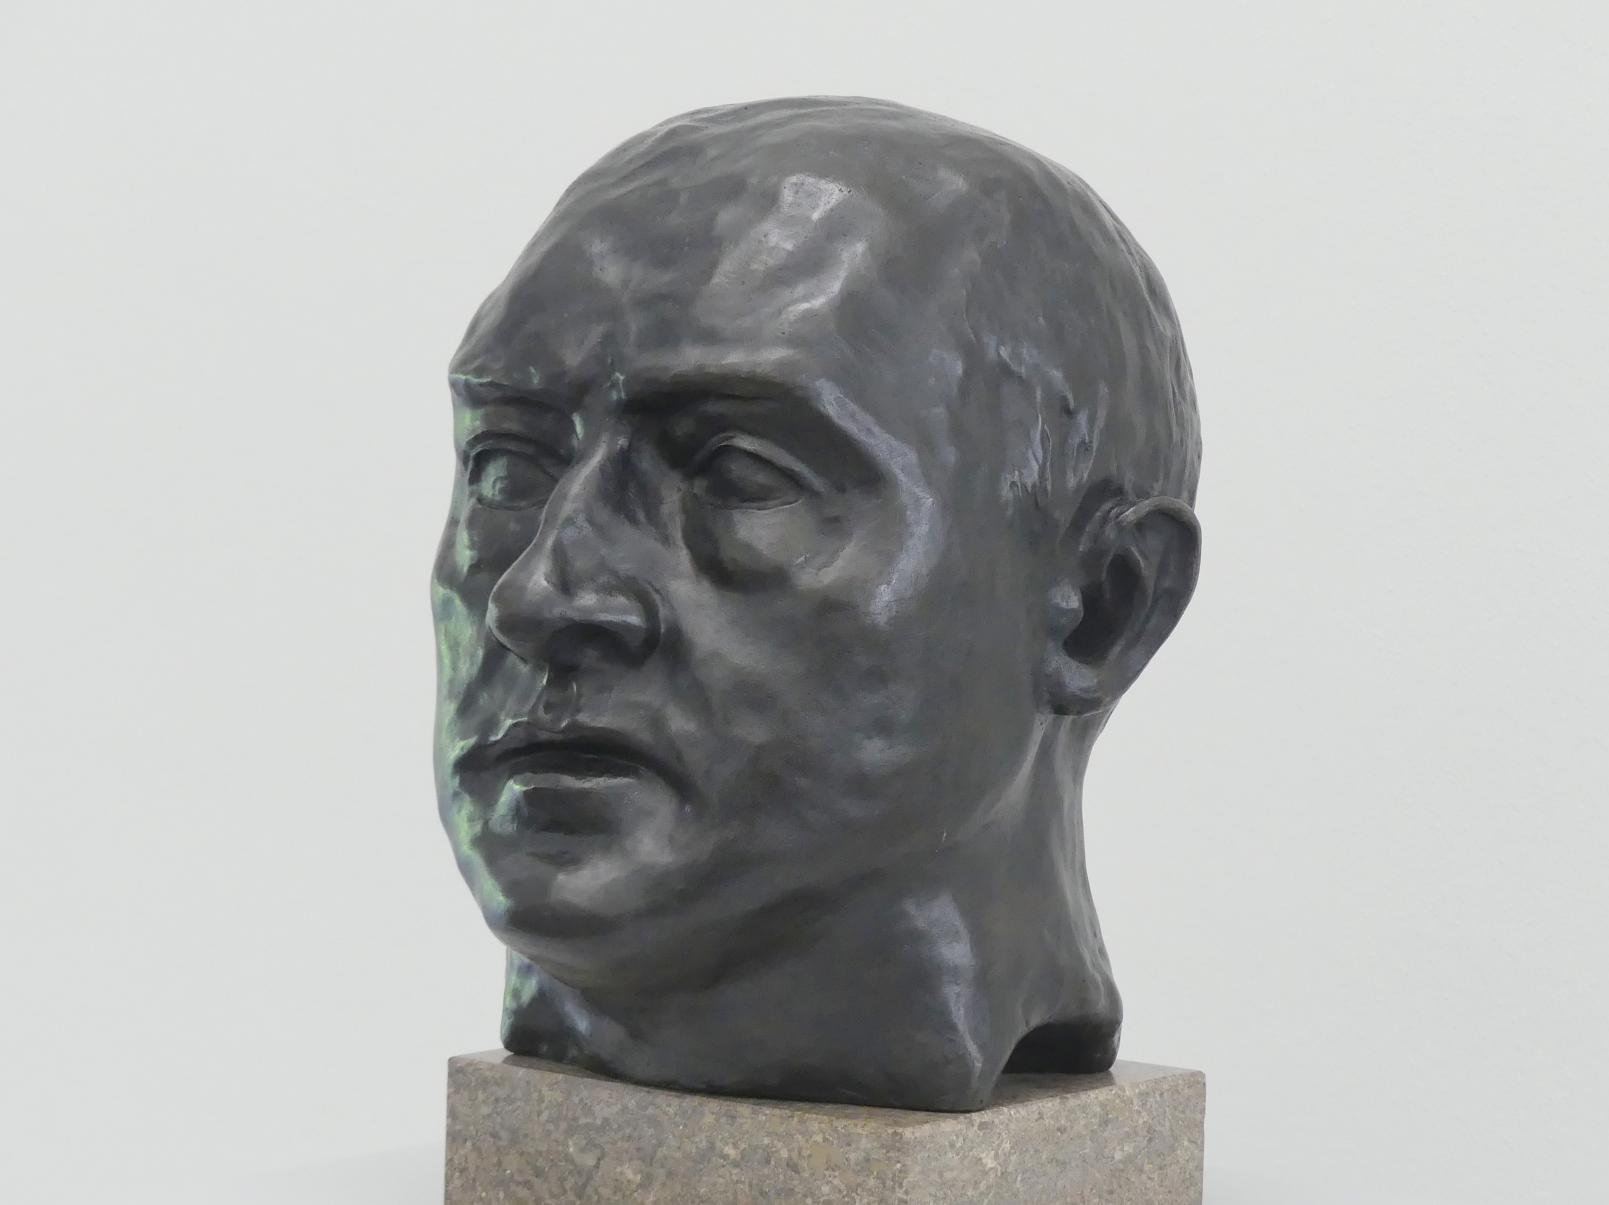 Max Beckmann: Selbstbildnis, 1936